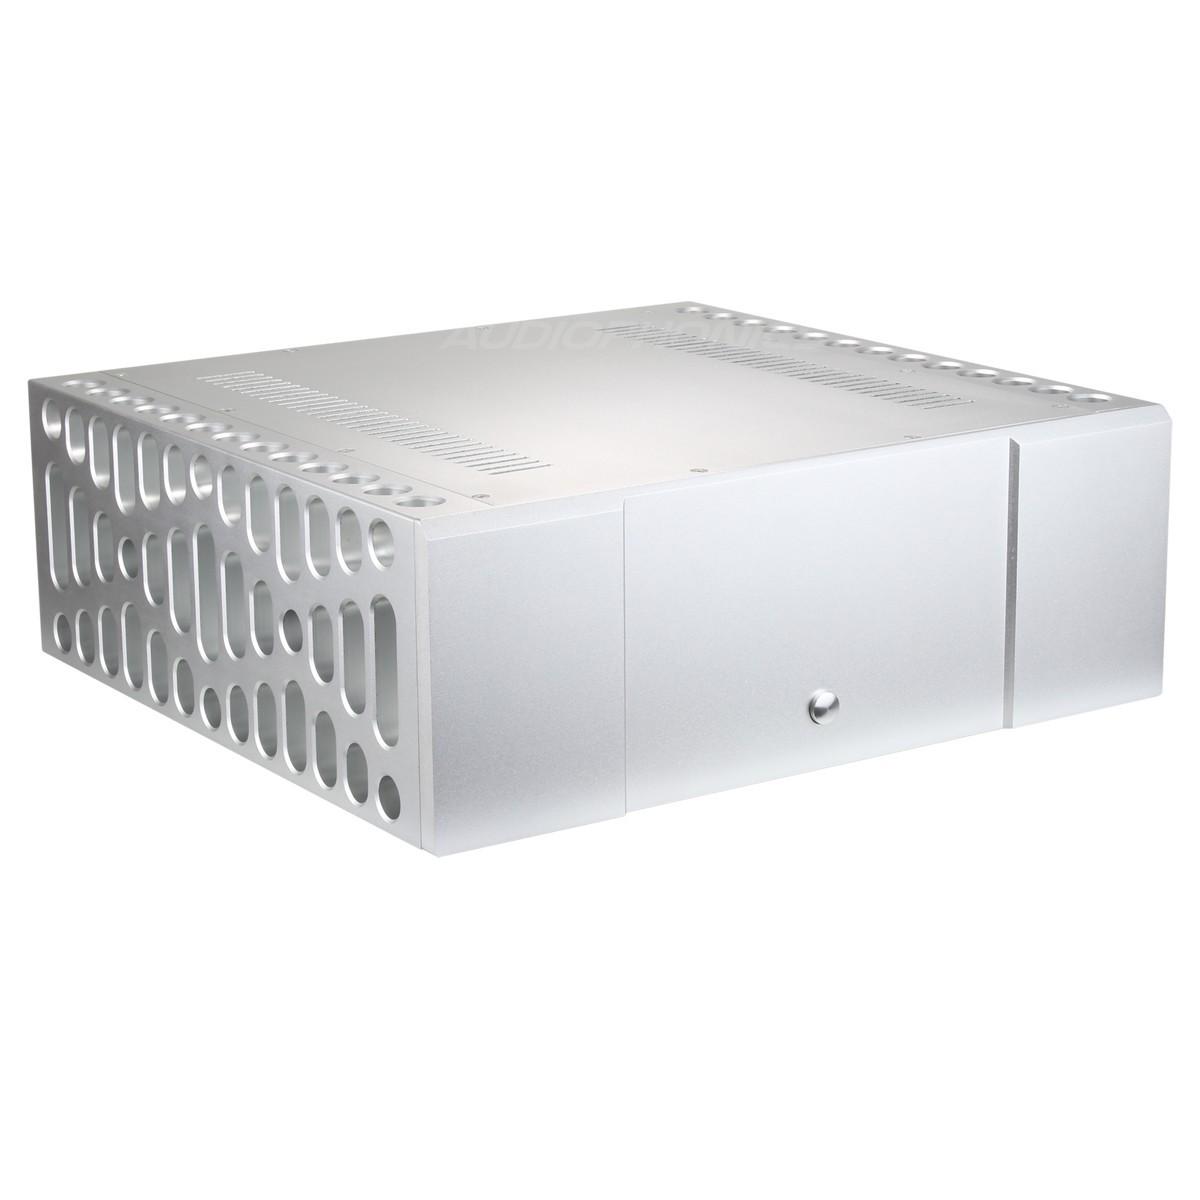 100% Aluminium DIY Box / Case for Hi-Fi Audio Amplifier 430x410x150mm